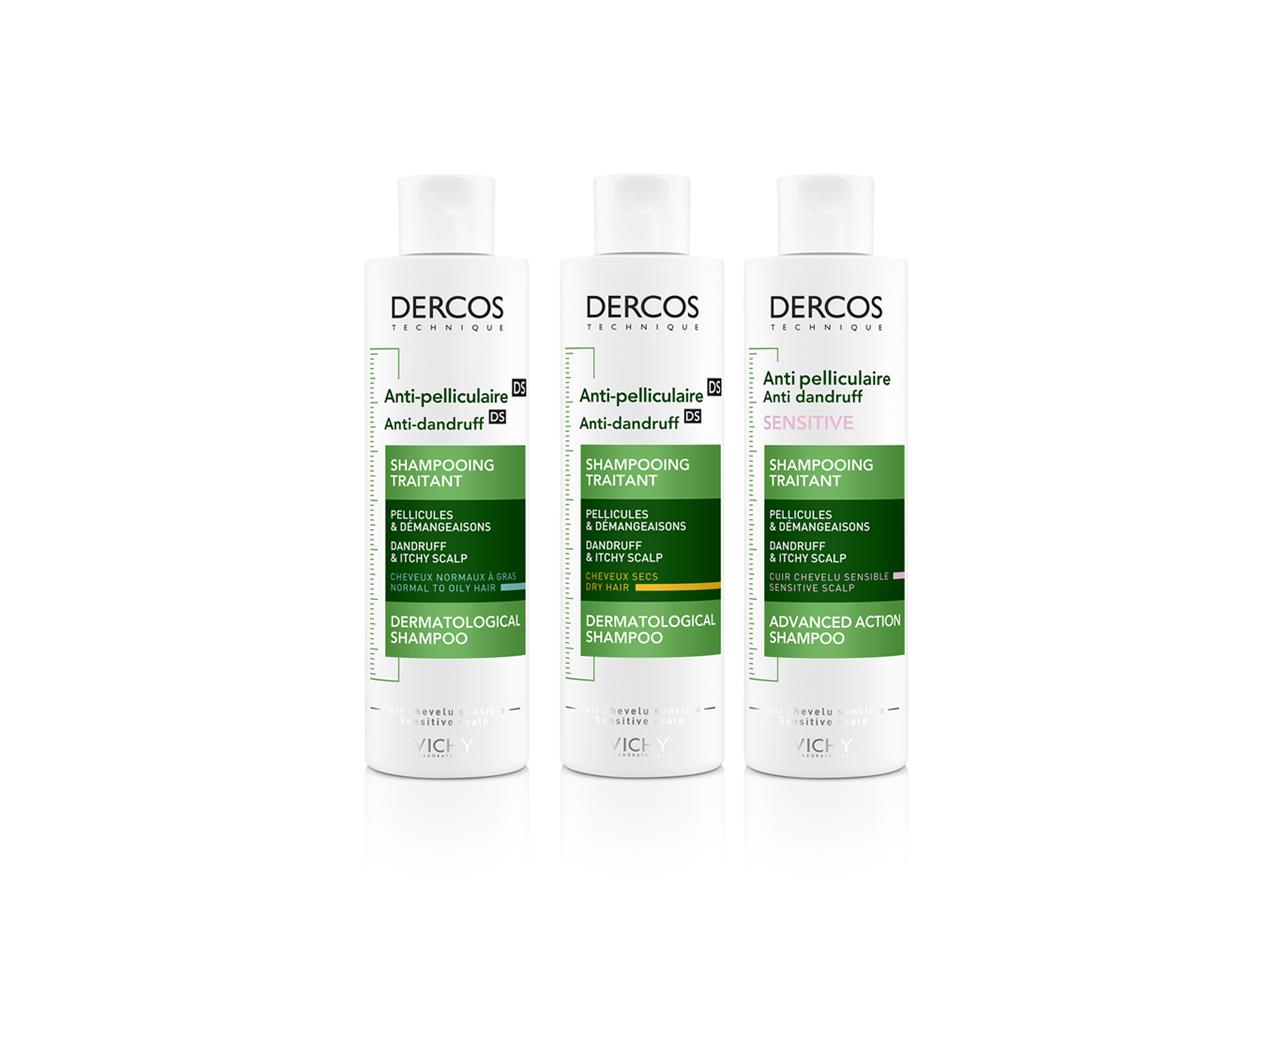 Anti-Dandruff DS dermatological shampoo - dandruff & itchy scalp – normal to oily hair